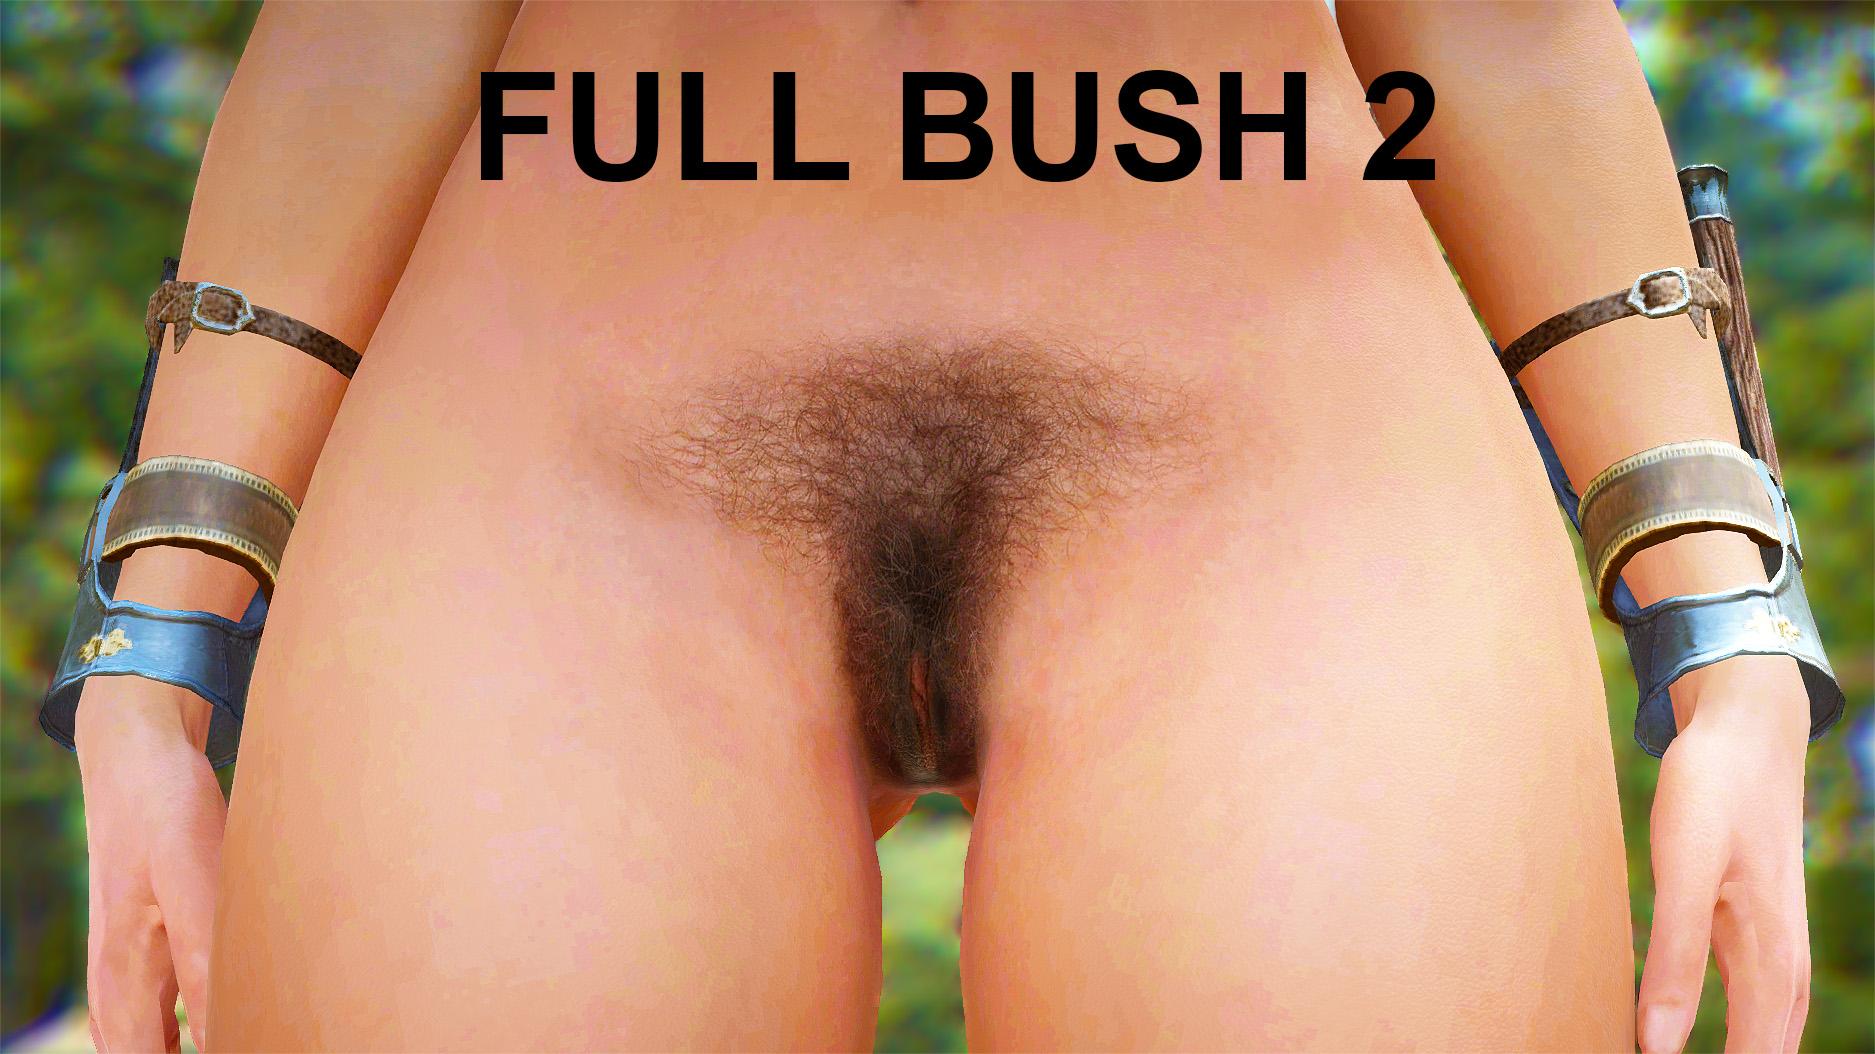 full_bush_2-jpg.60008